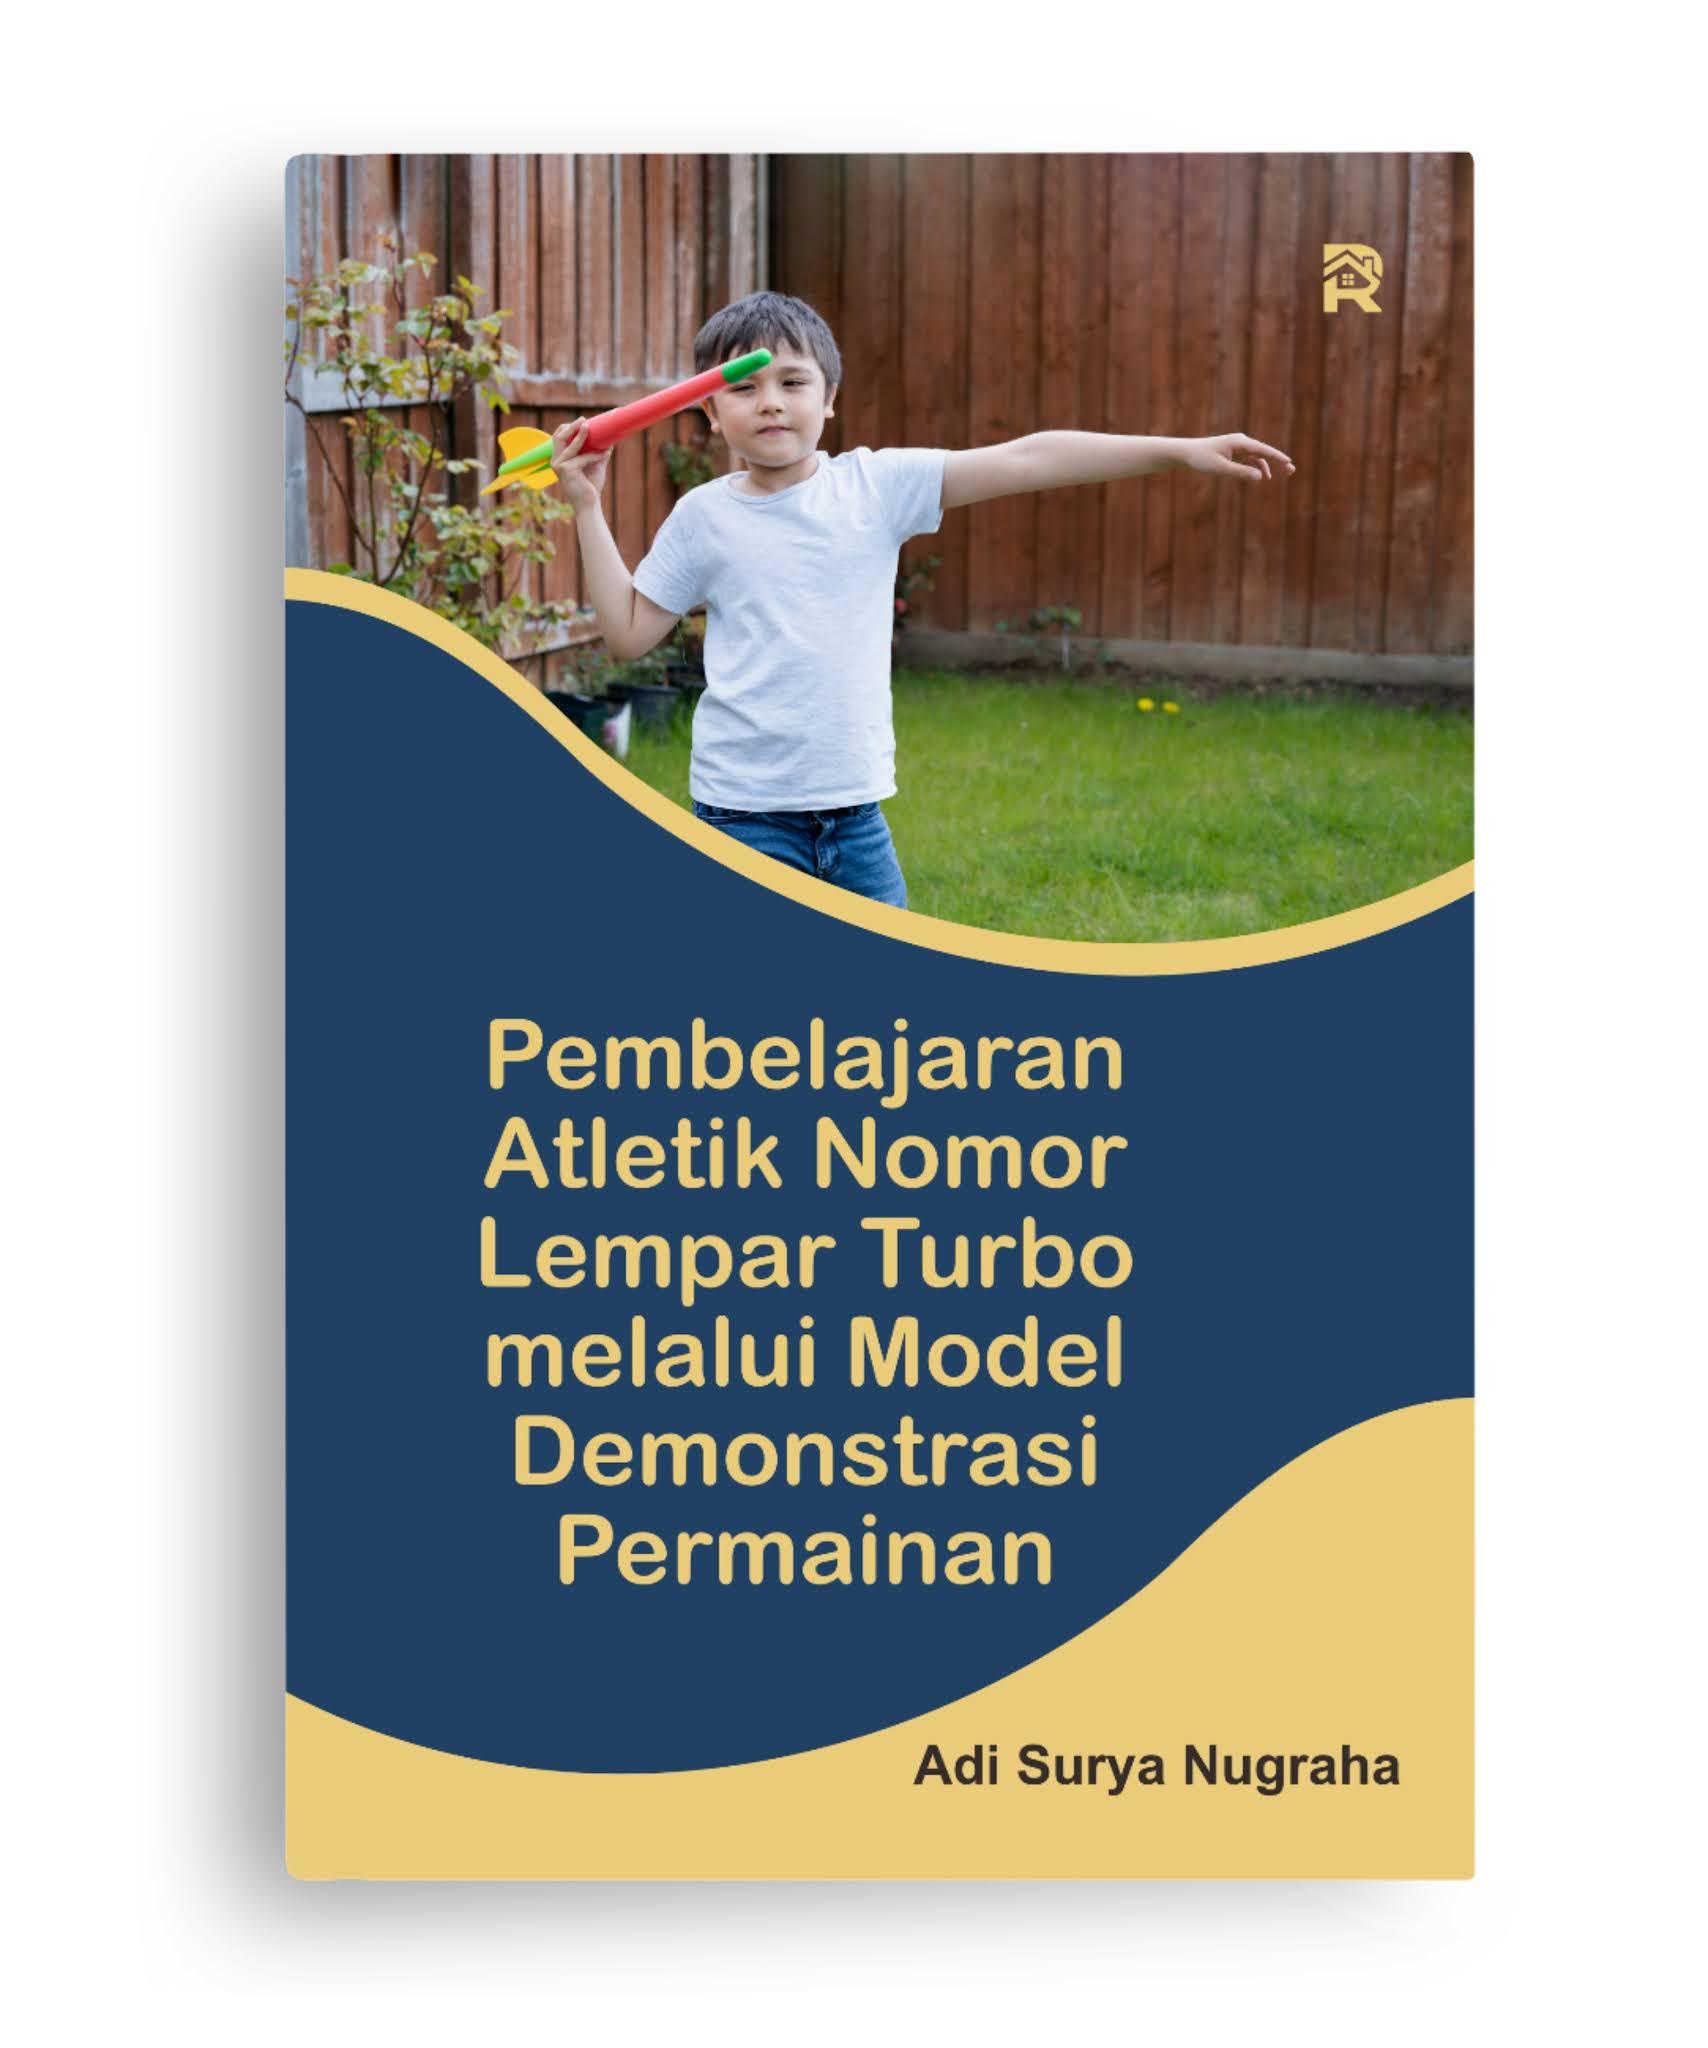 Pembelajaran Atletik Nomor Lempar Turbo melalui Model Demonstrasi Permainan